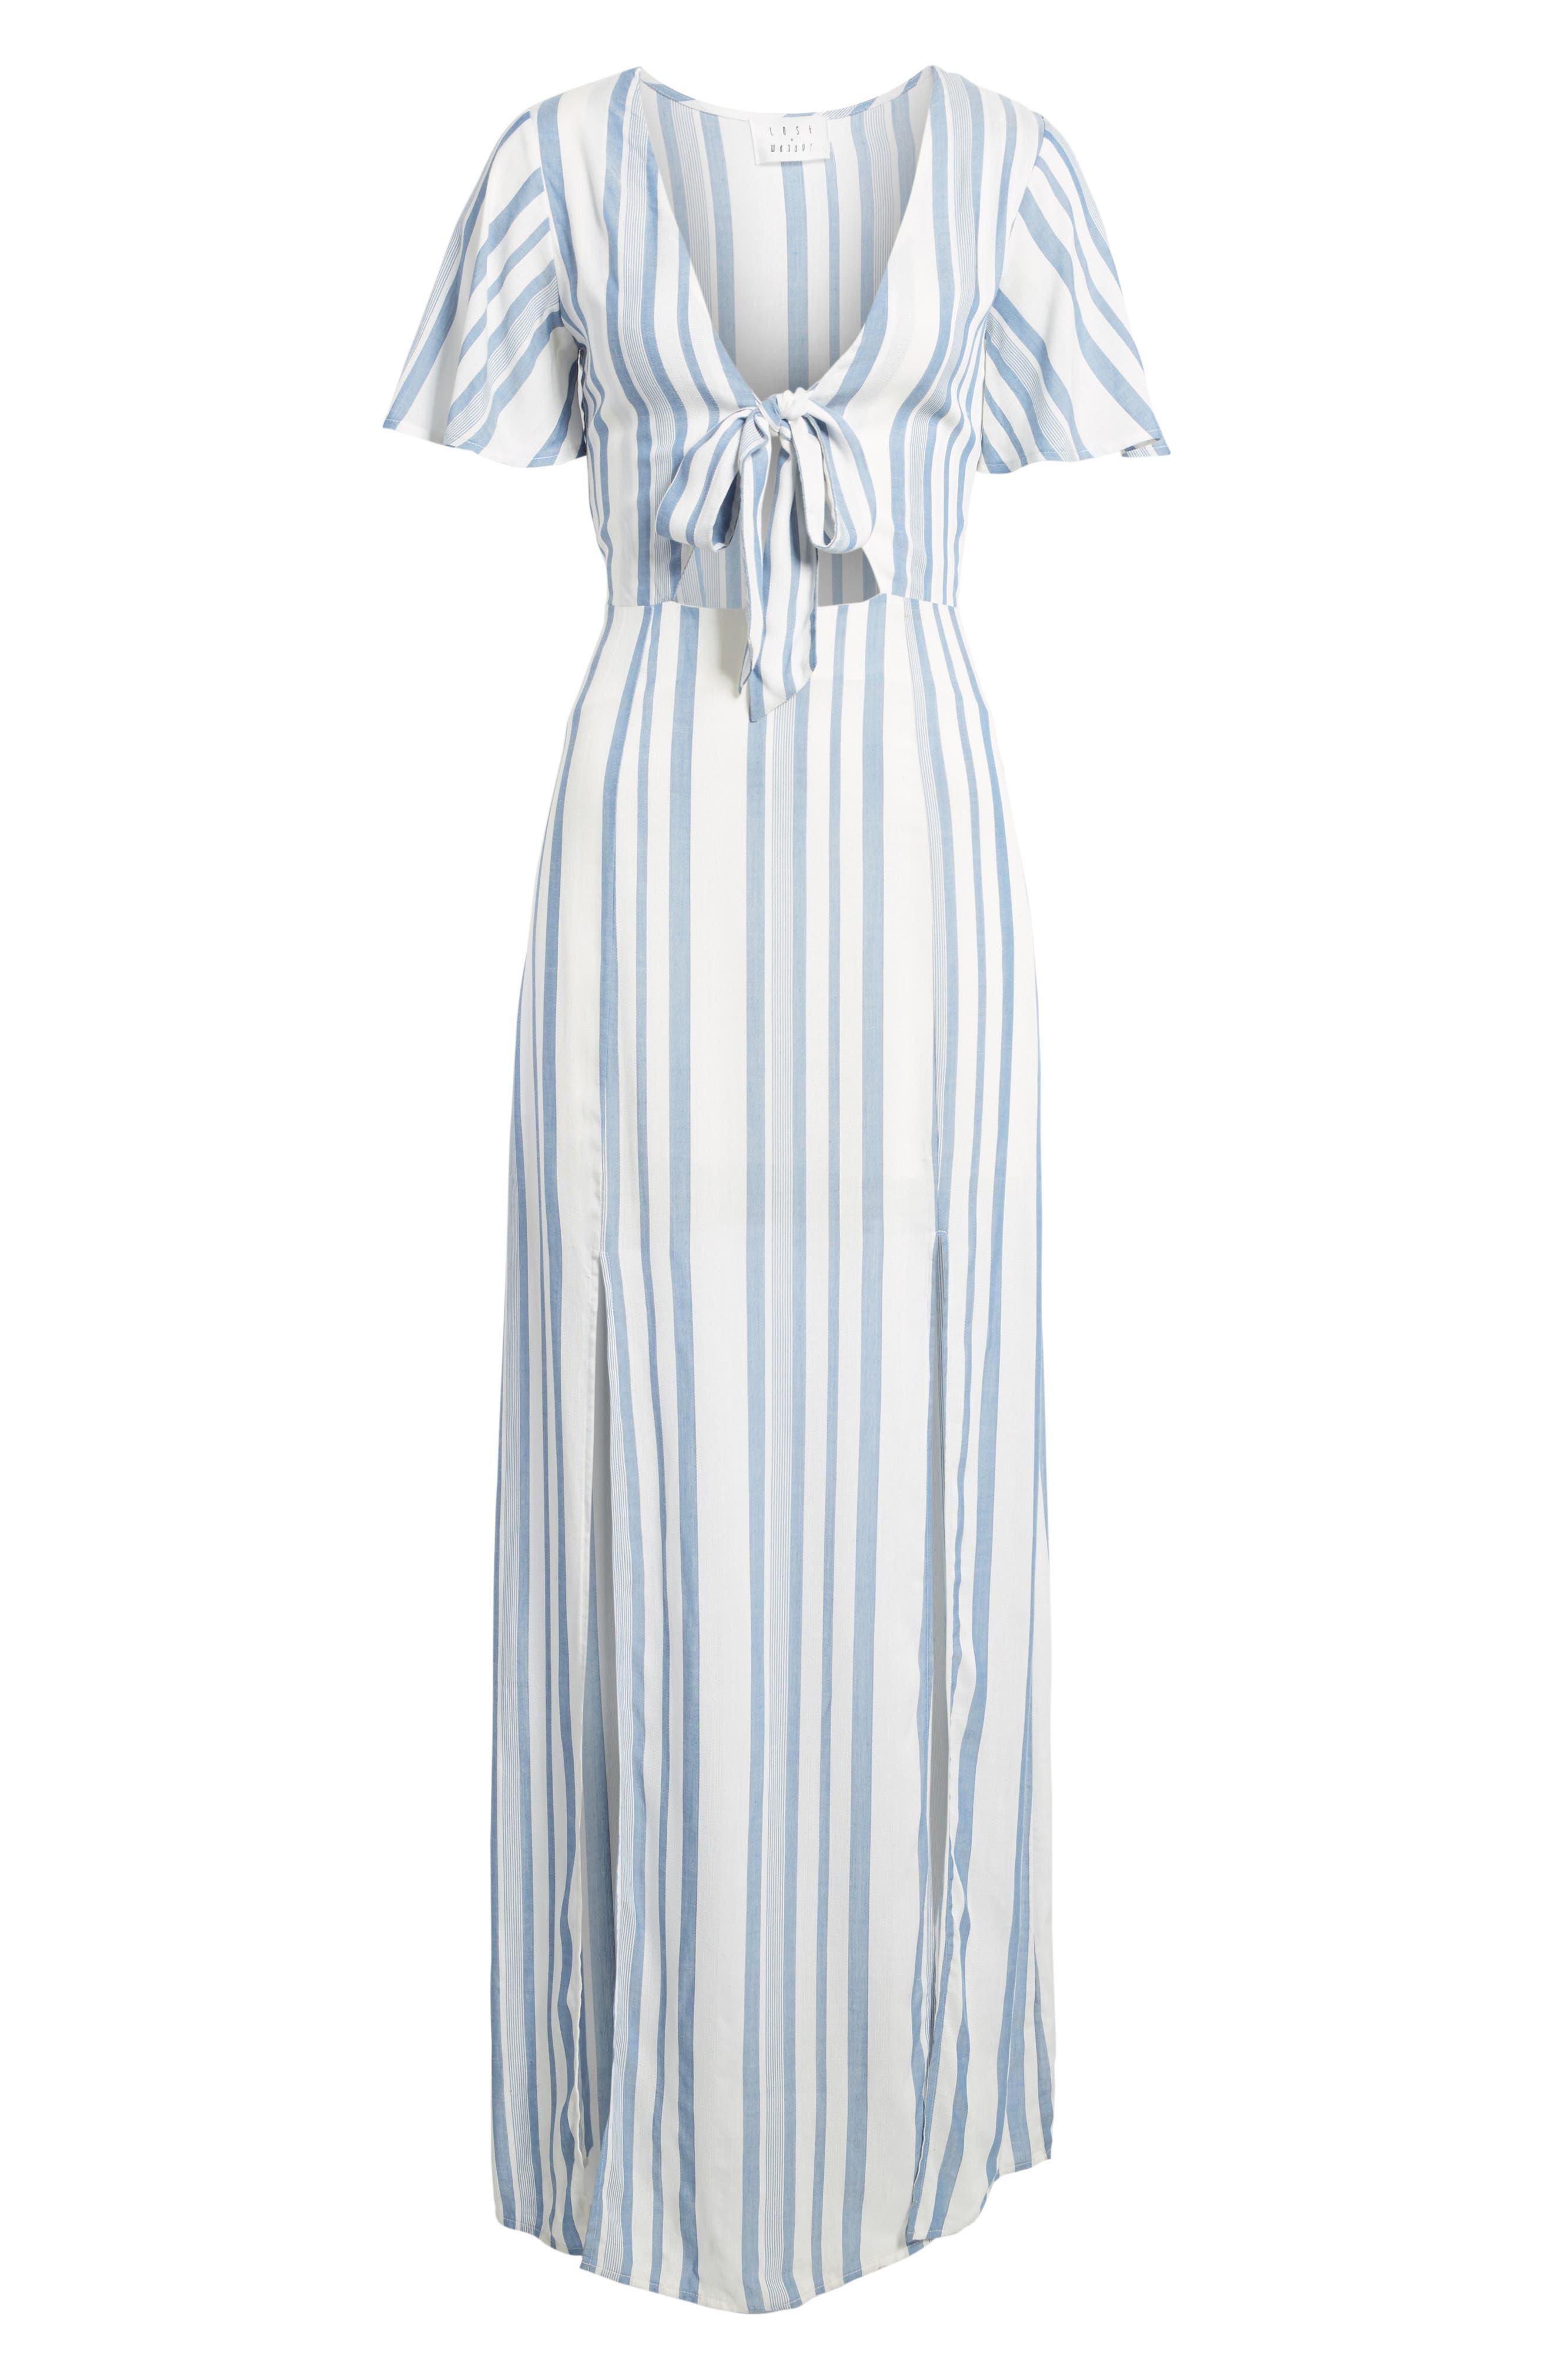 Bow Front Marina Maxi Dress,                             Alternate thumbnail 6, color,                             White/ Blue